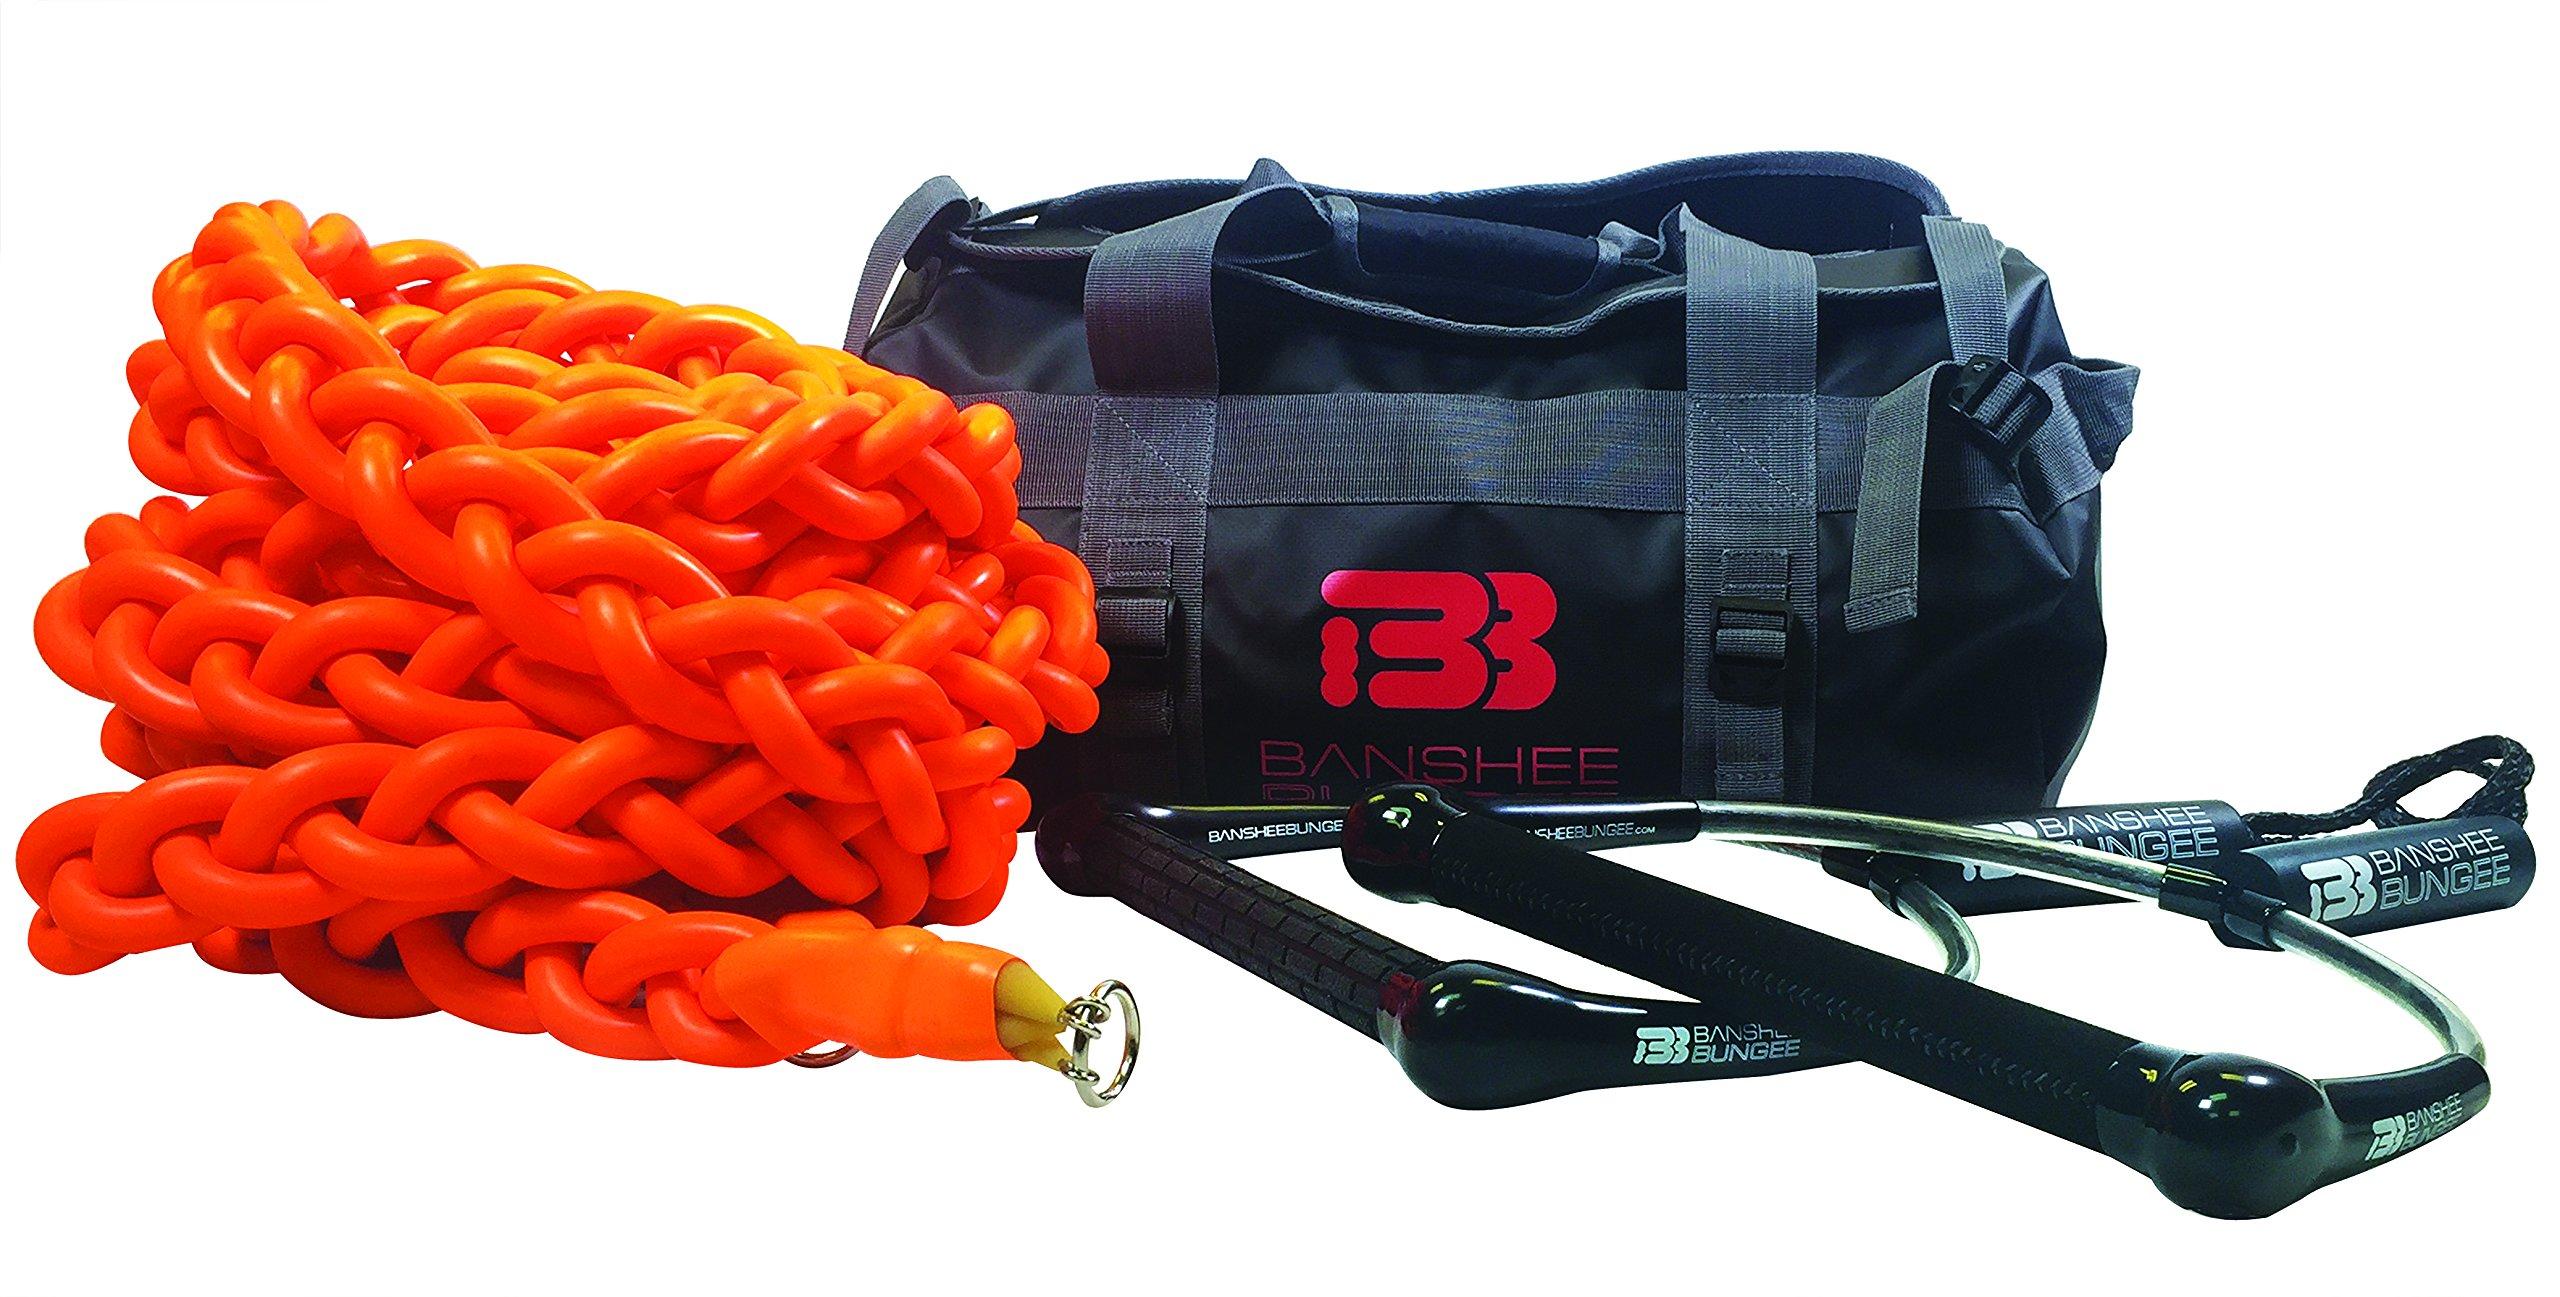 Banshee Bungee 25 Foot Pro Package